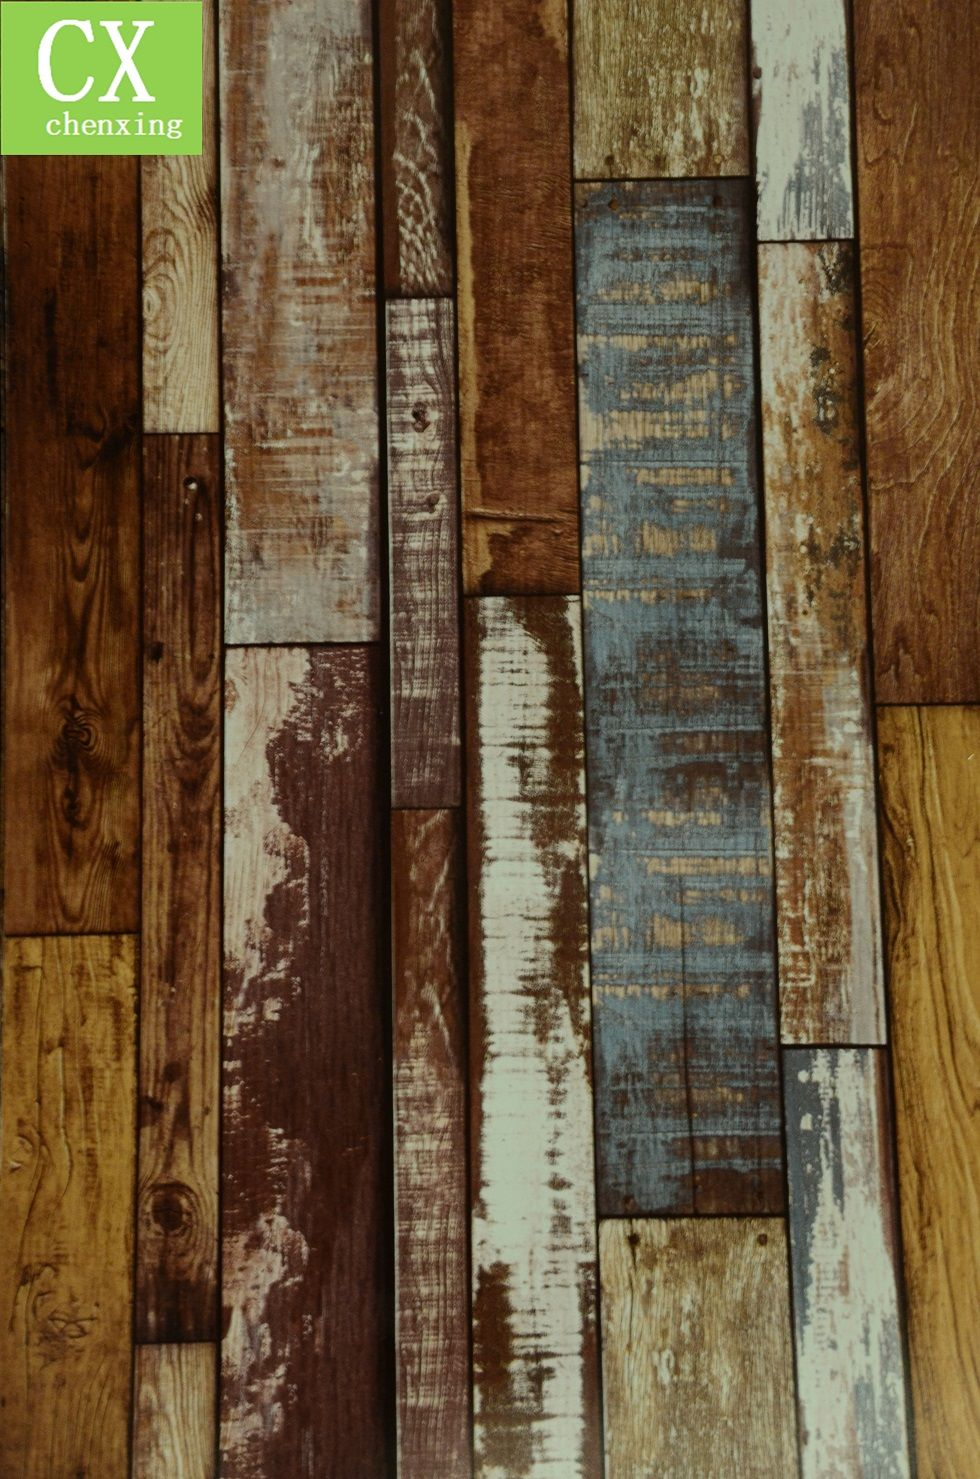 Chenxing Popular Laminate Flooring, Ac4 Ac5 Laminate Flooring